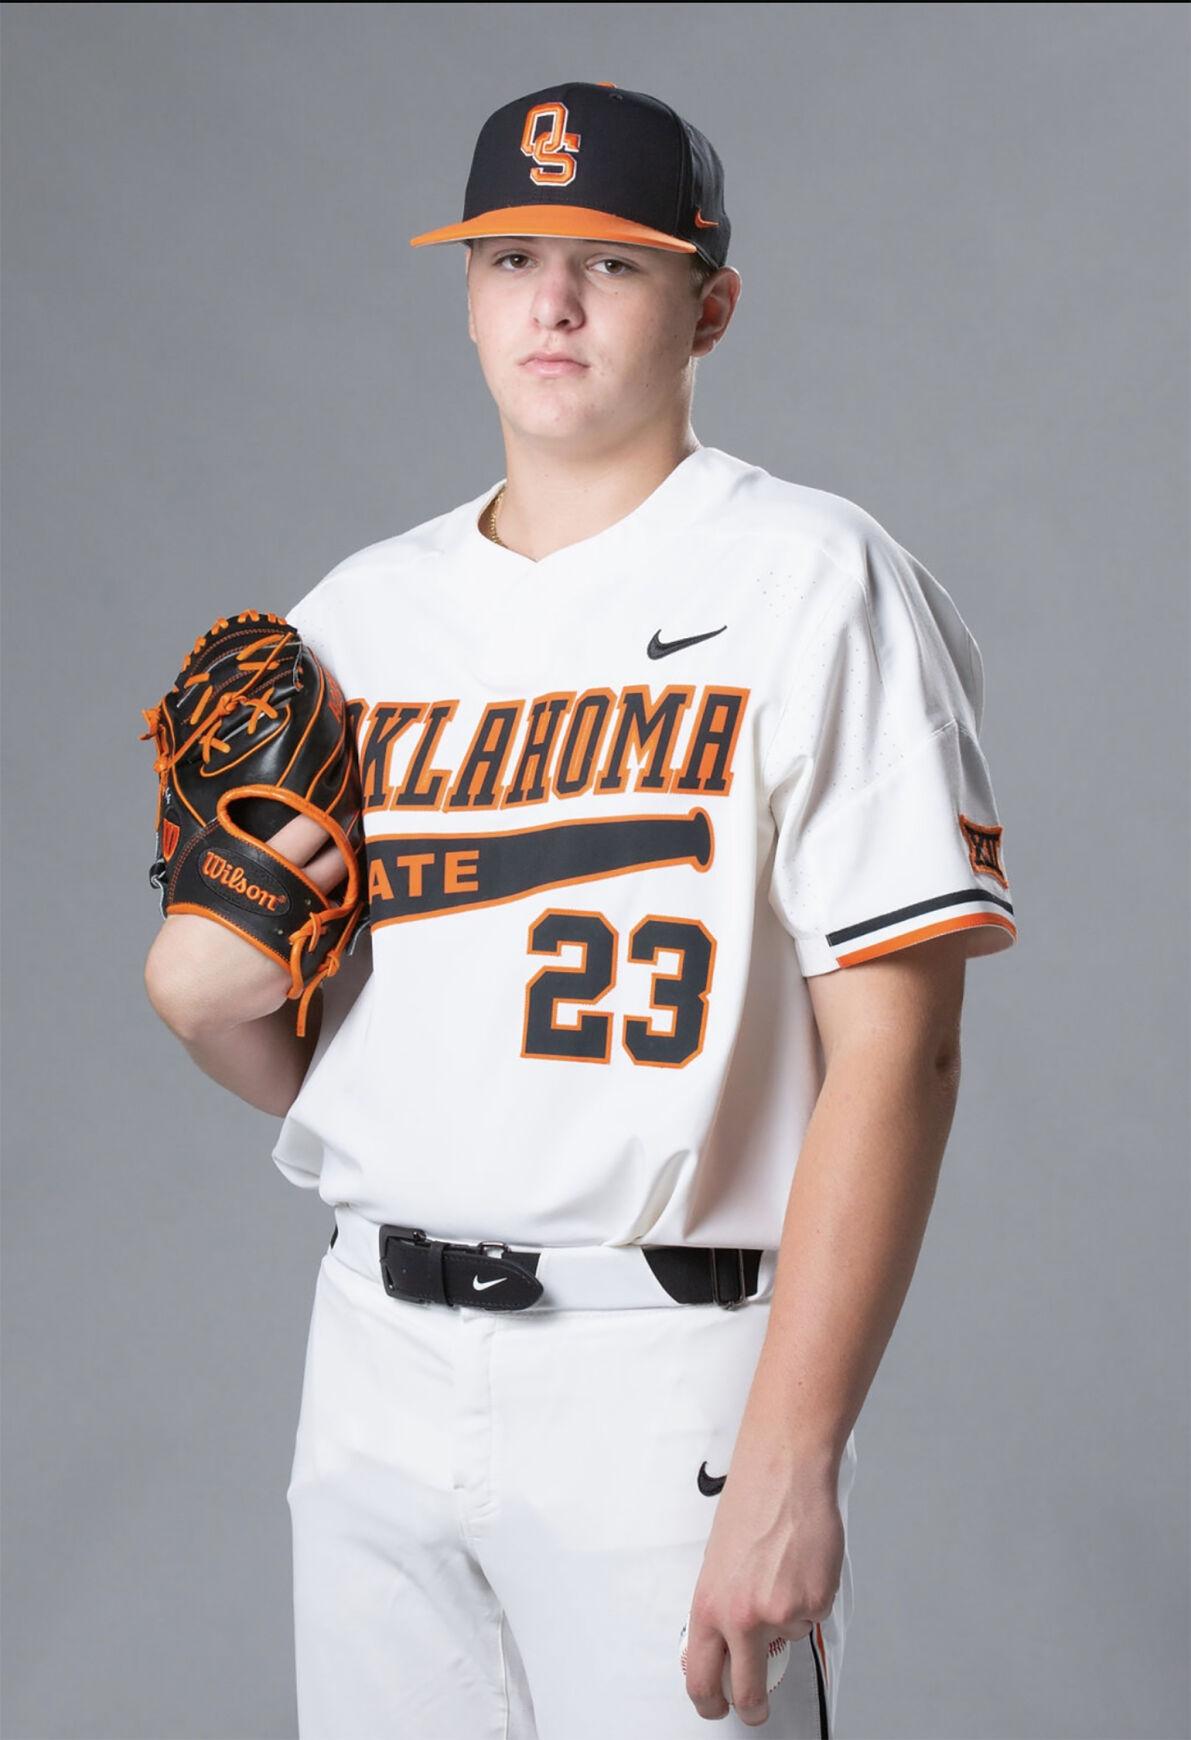 Rouse commits to Oklahoma State University baseball team